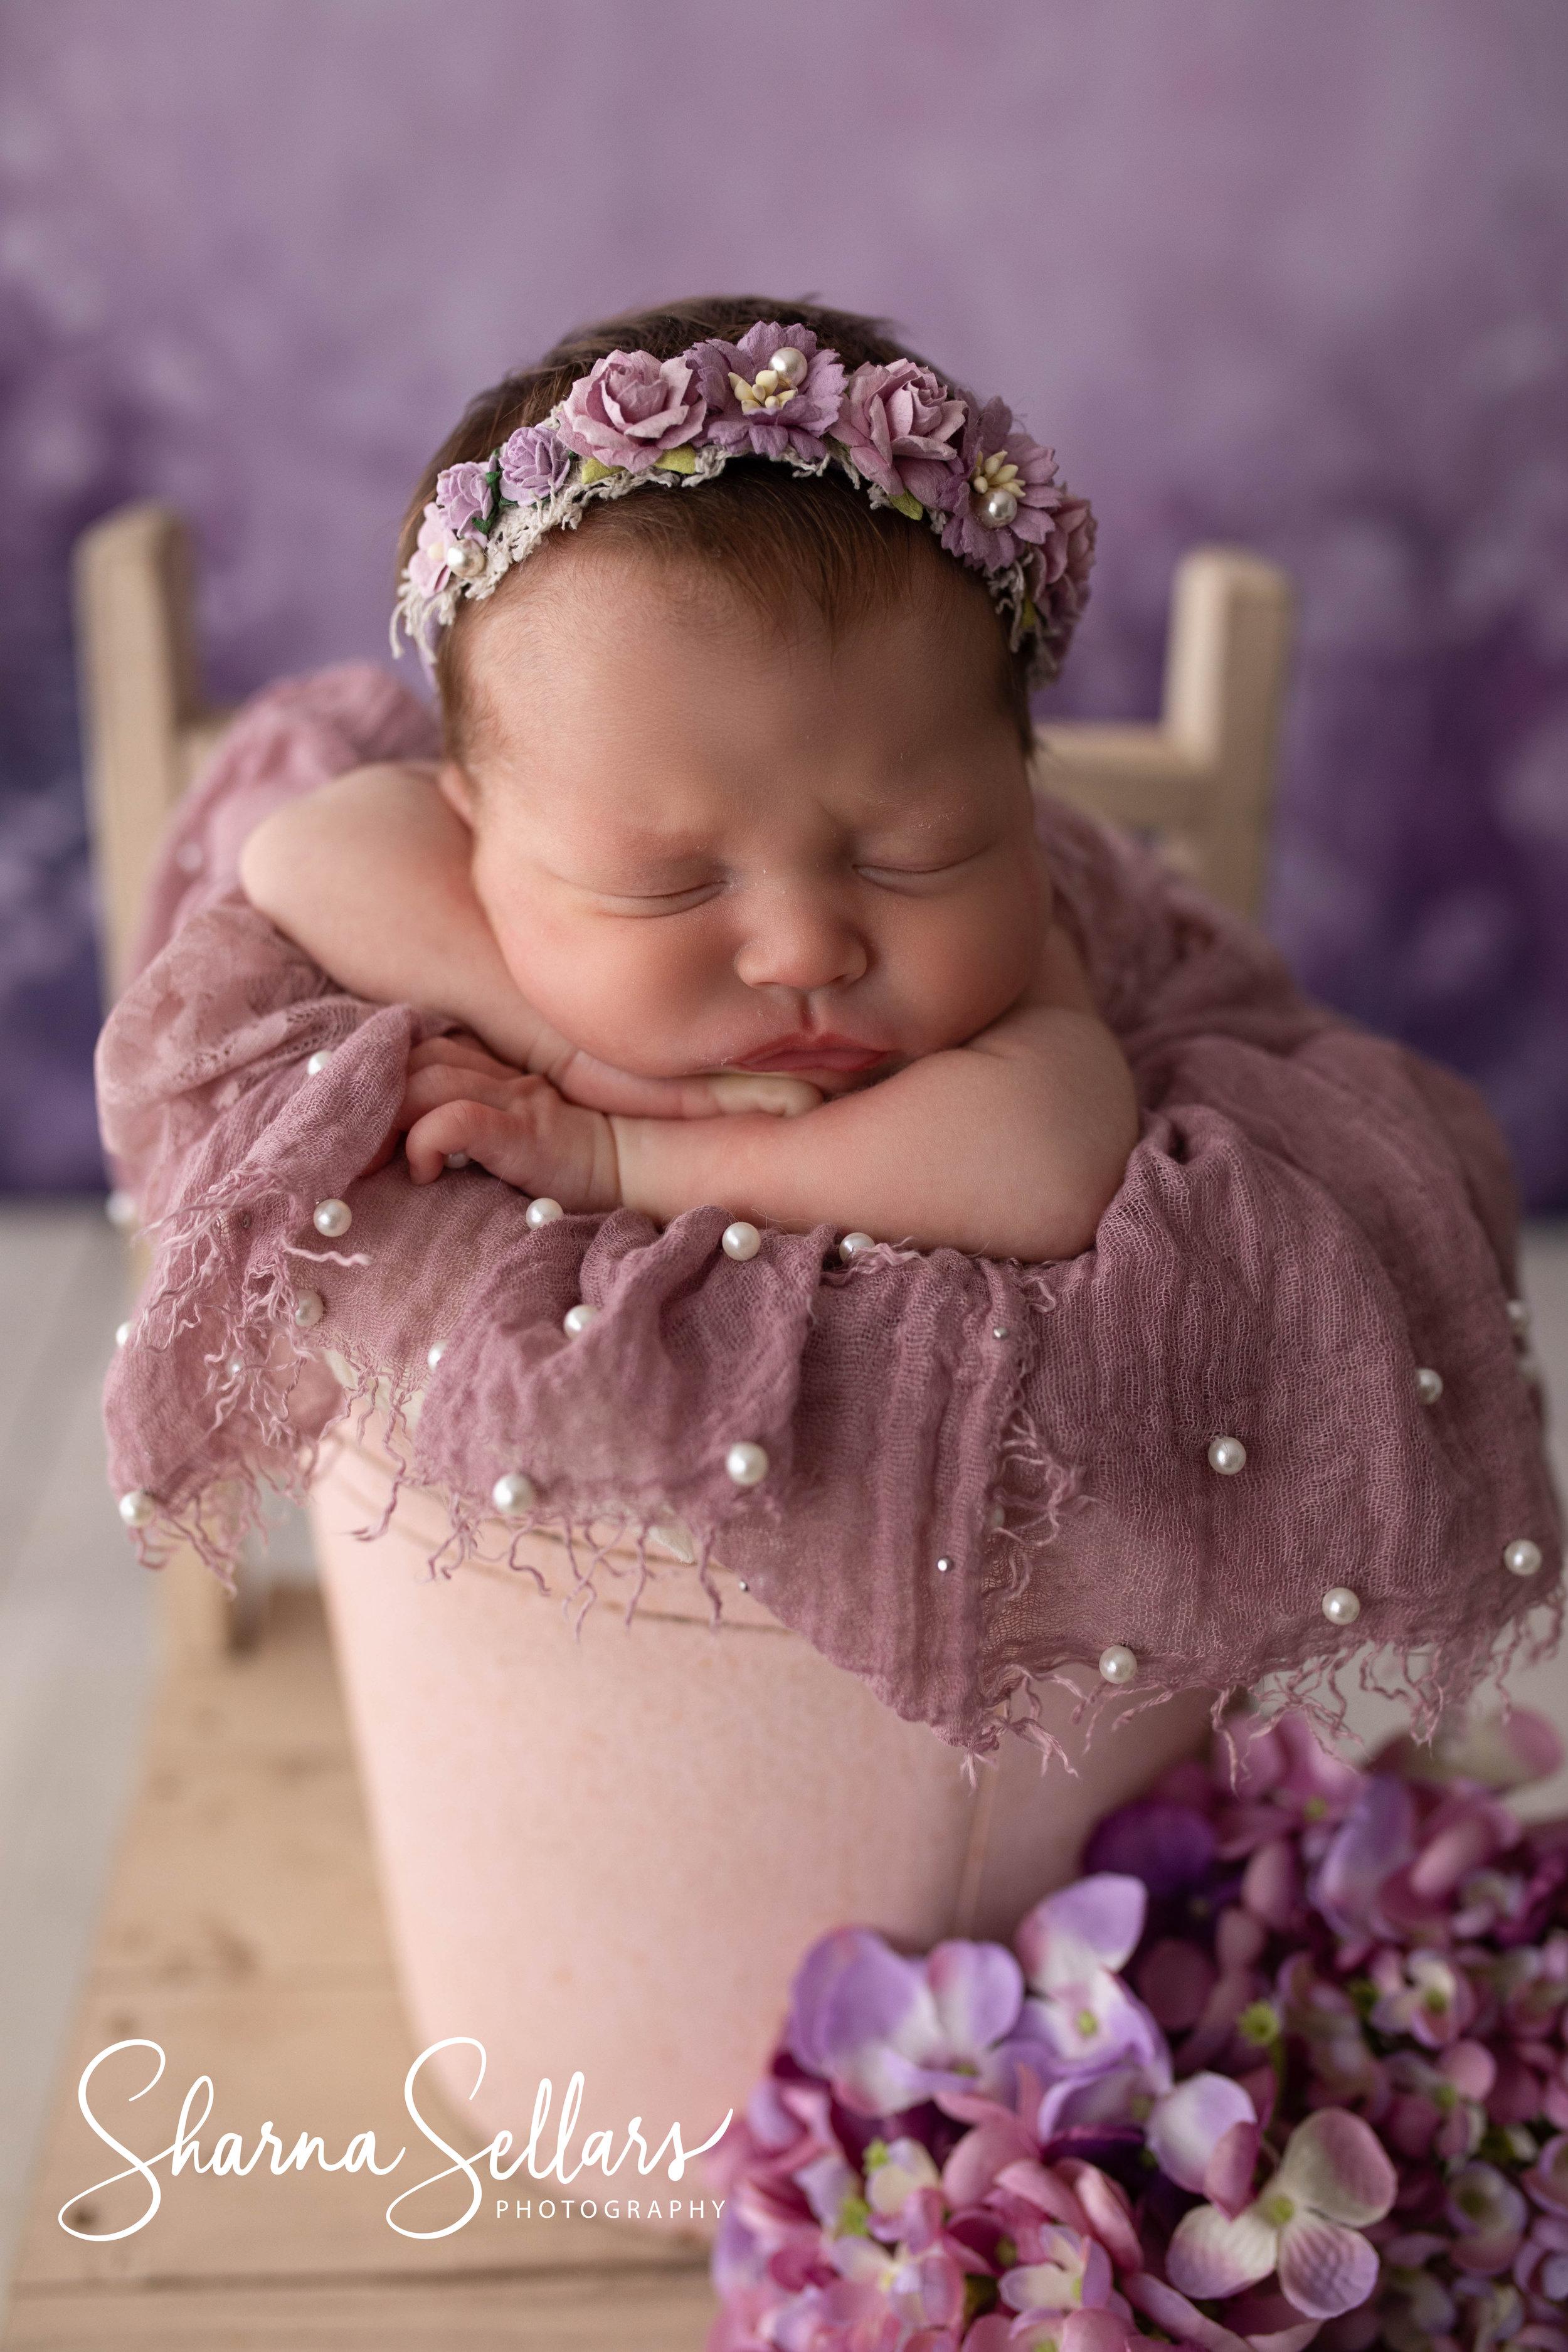 124A5207-Edit2019-28-2019 Ahiliah newborn.jpg logo.jpg